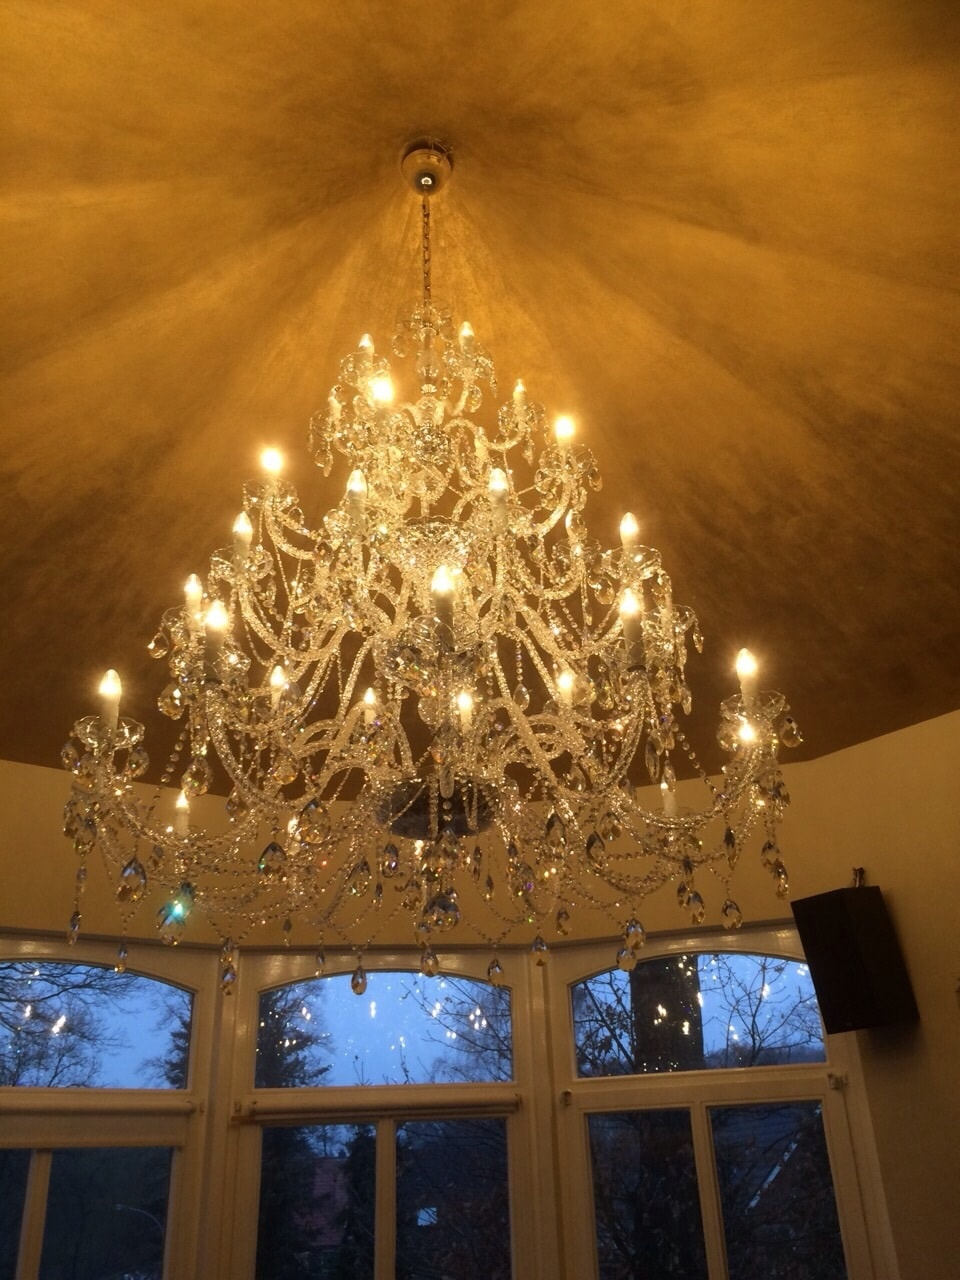 JWZ 116362101, interiér, Grandiose v interiéru, Německo restaurace Gold a Gray 2014 (6) .jpg